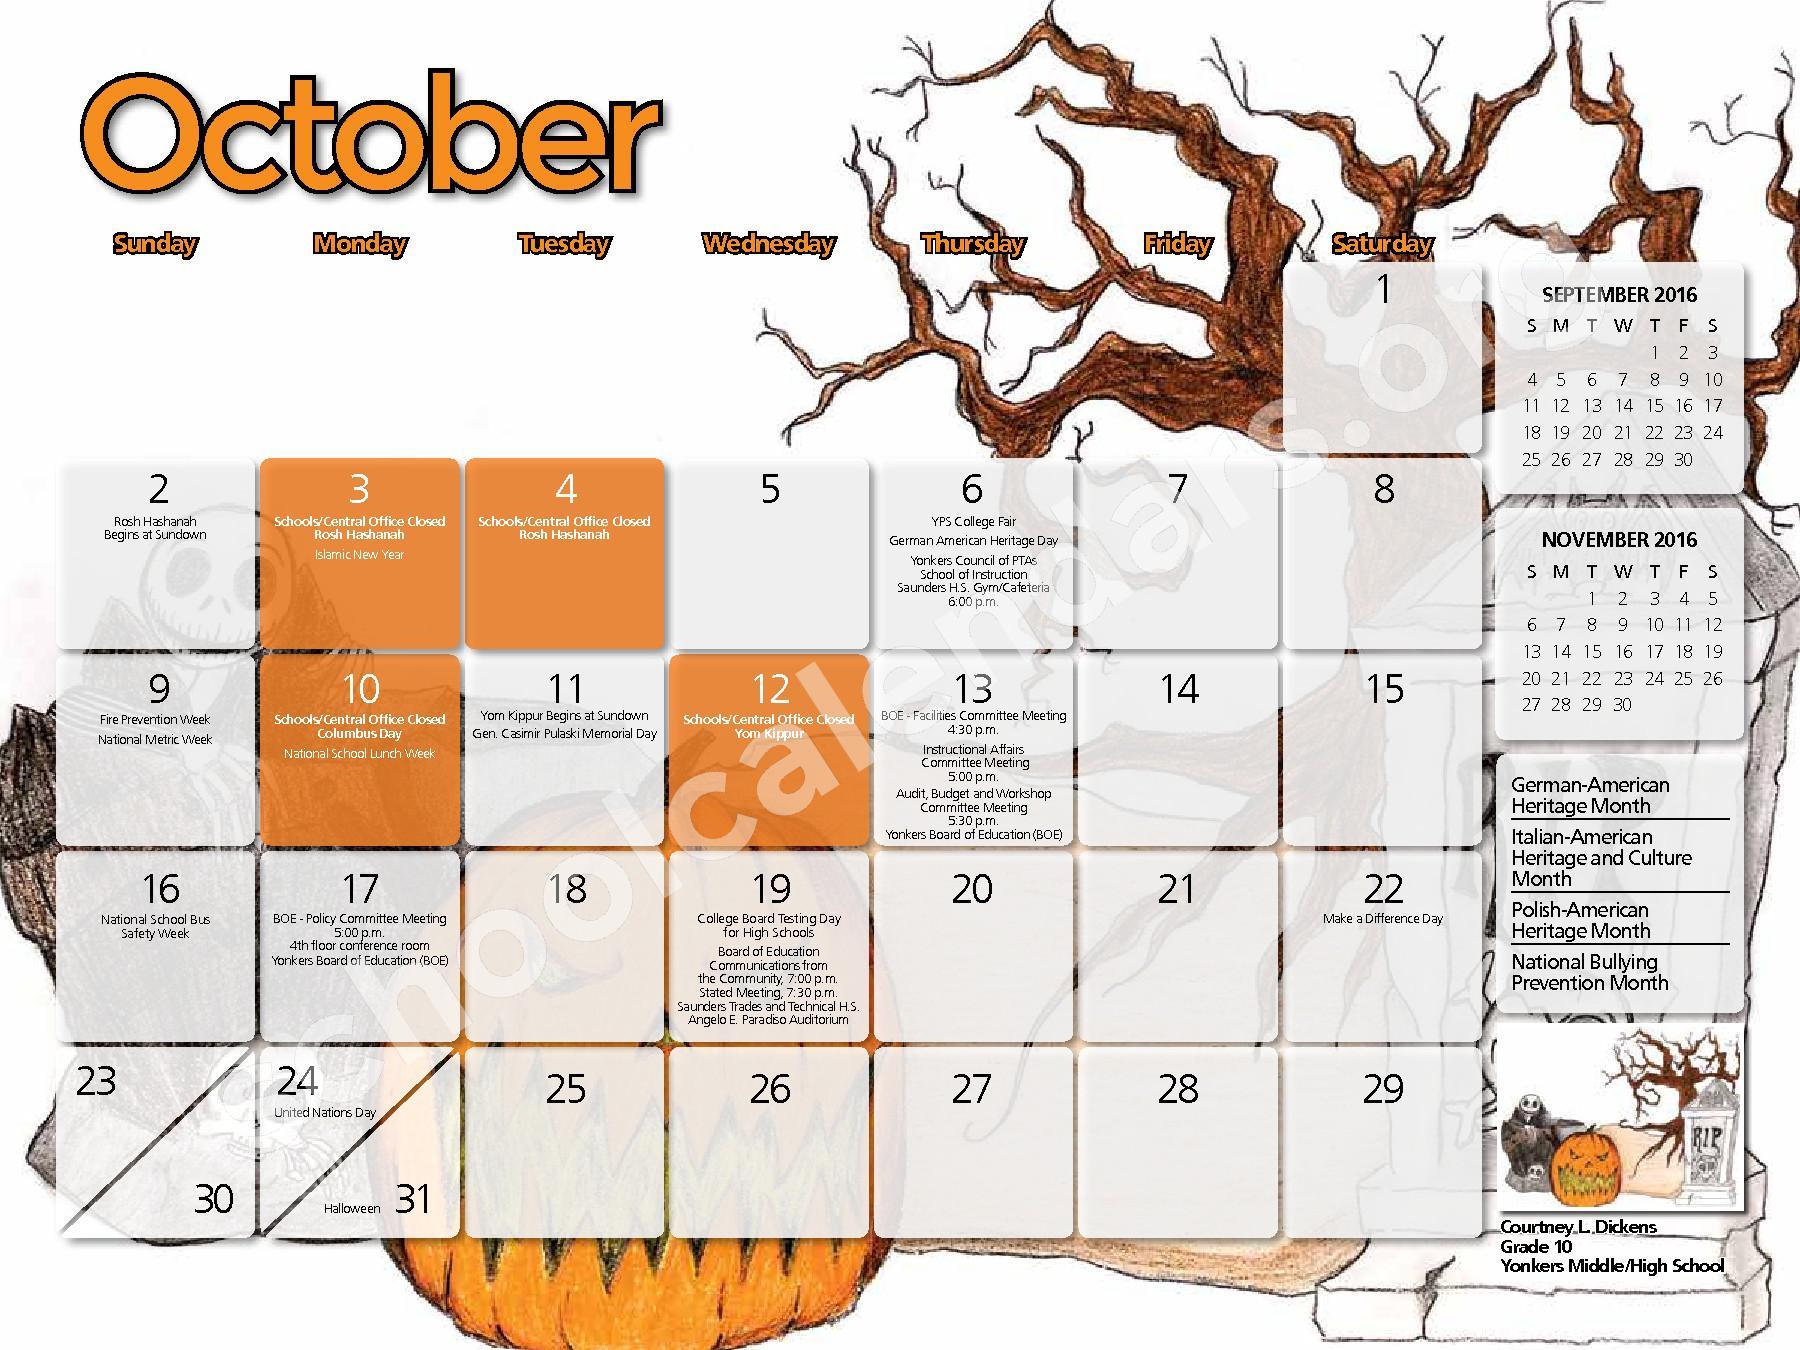 2017 - 2018 District Calendar – Yonkers City School District – page 7